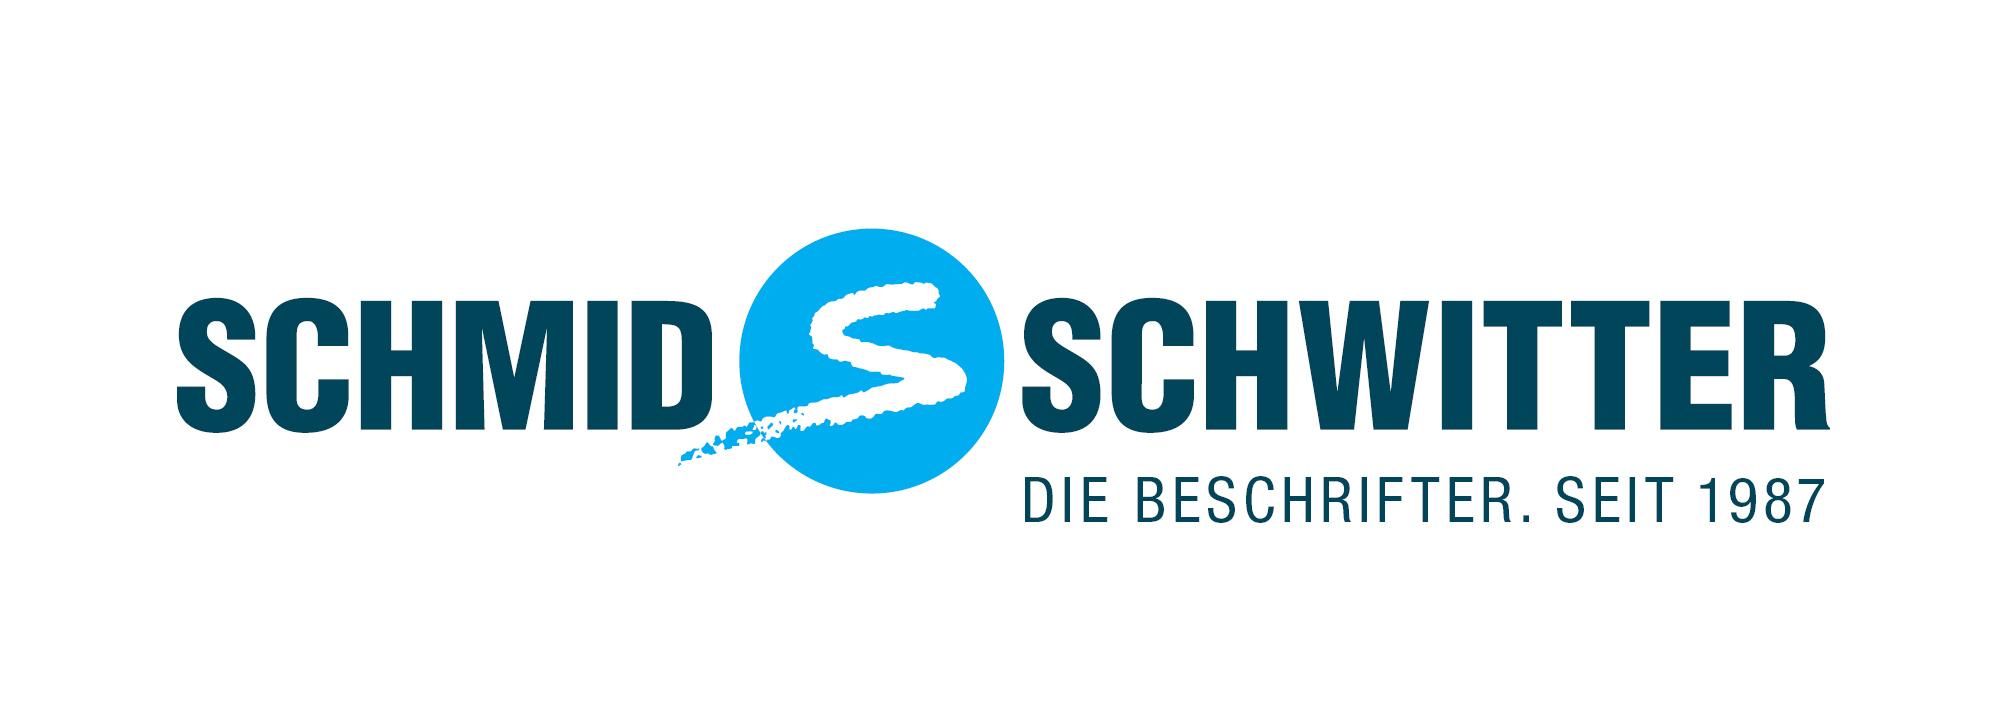 Schmid & Schwitter